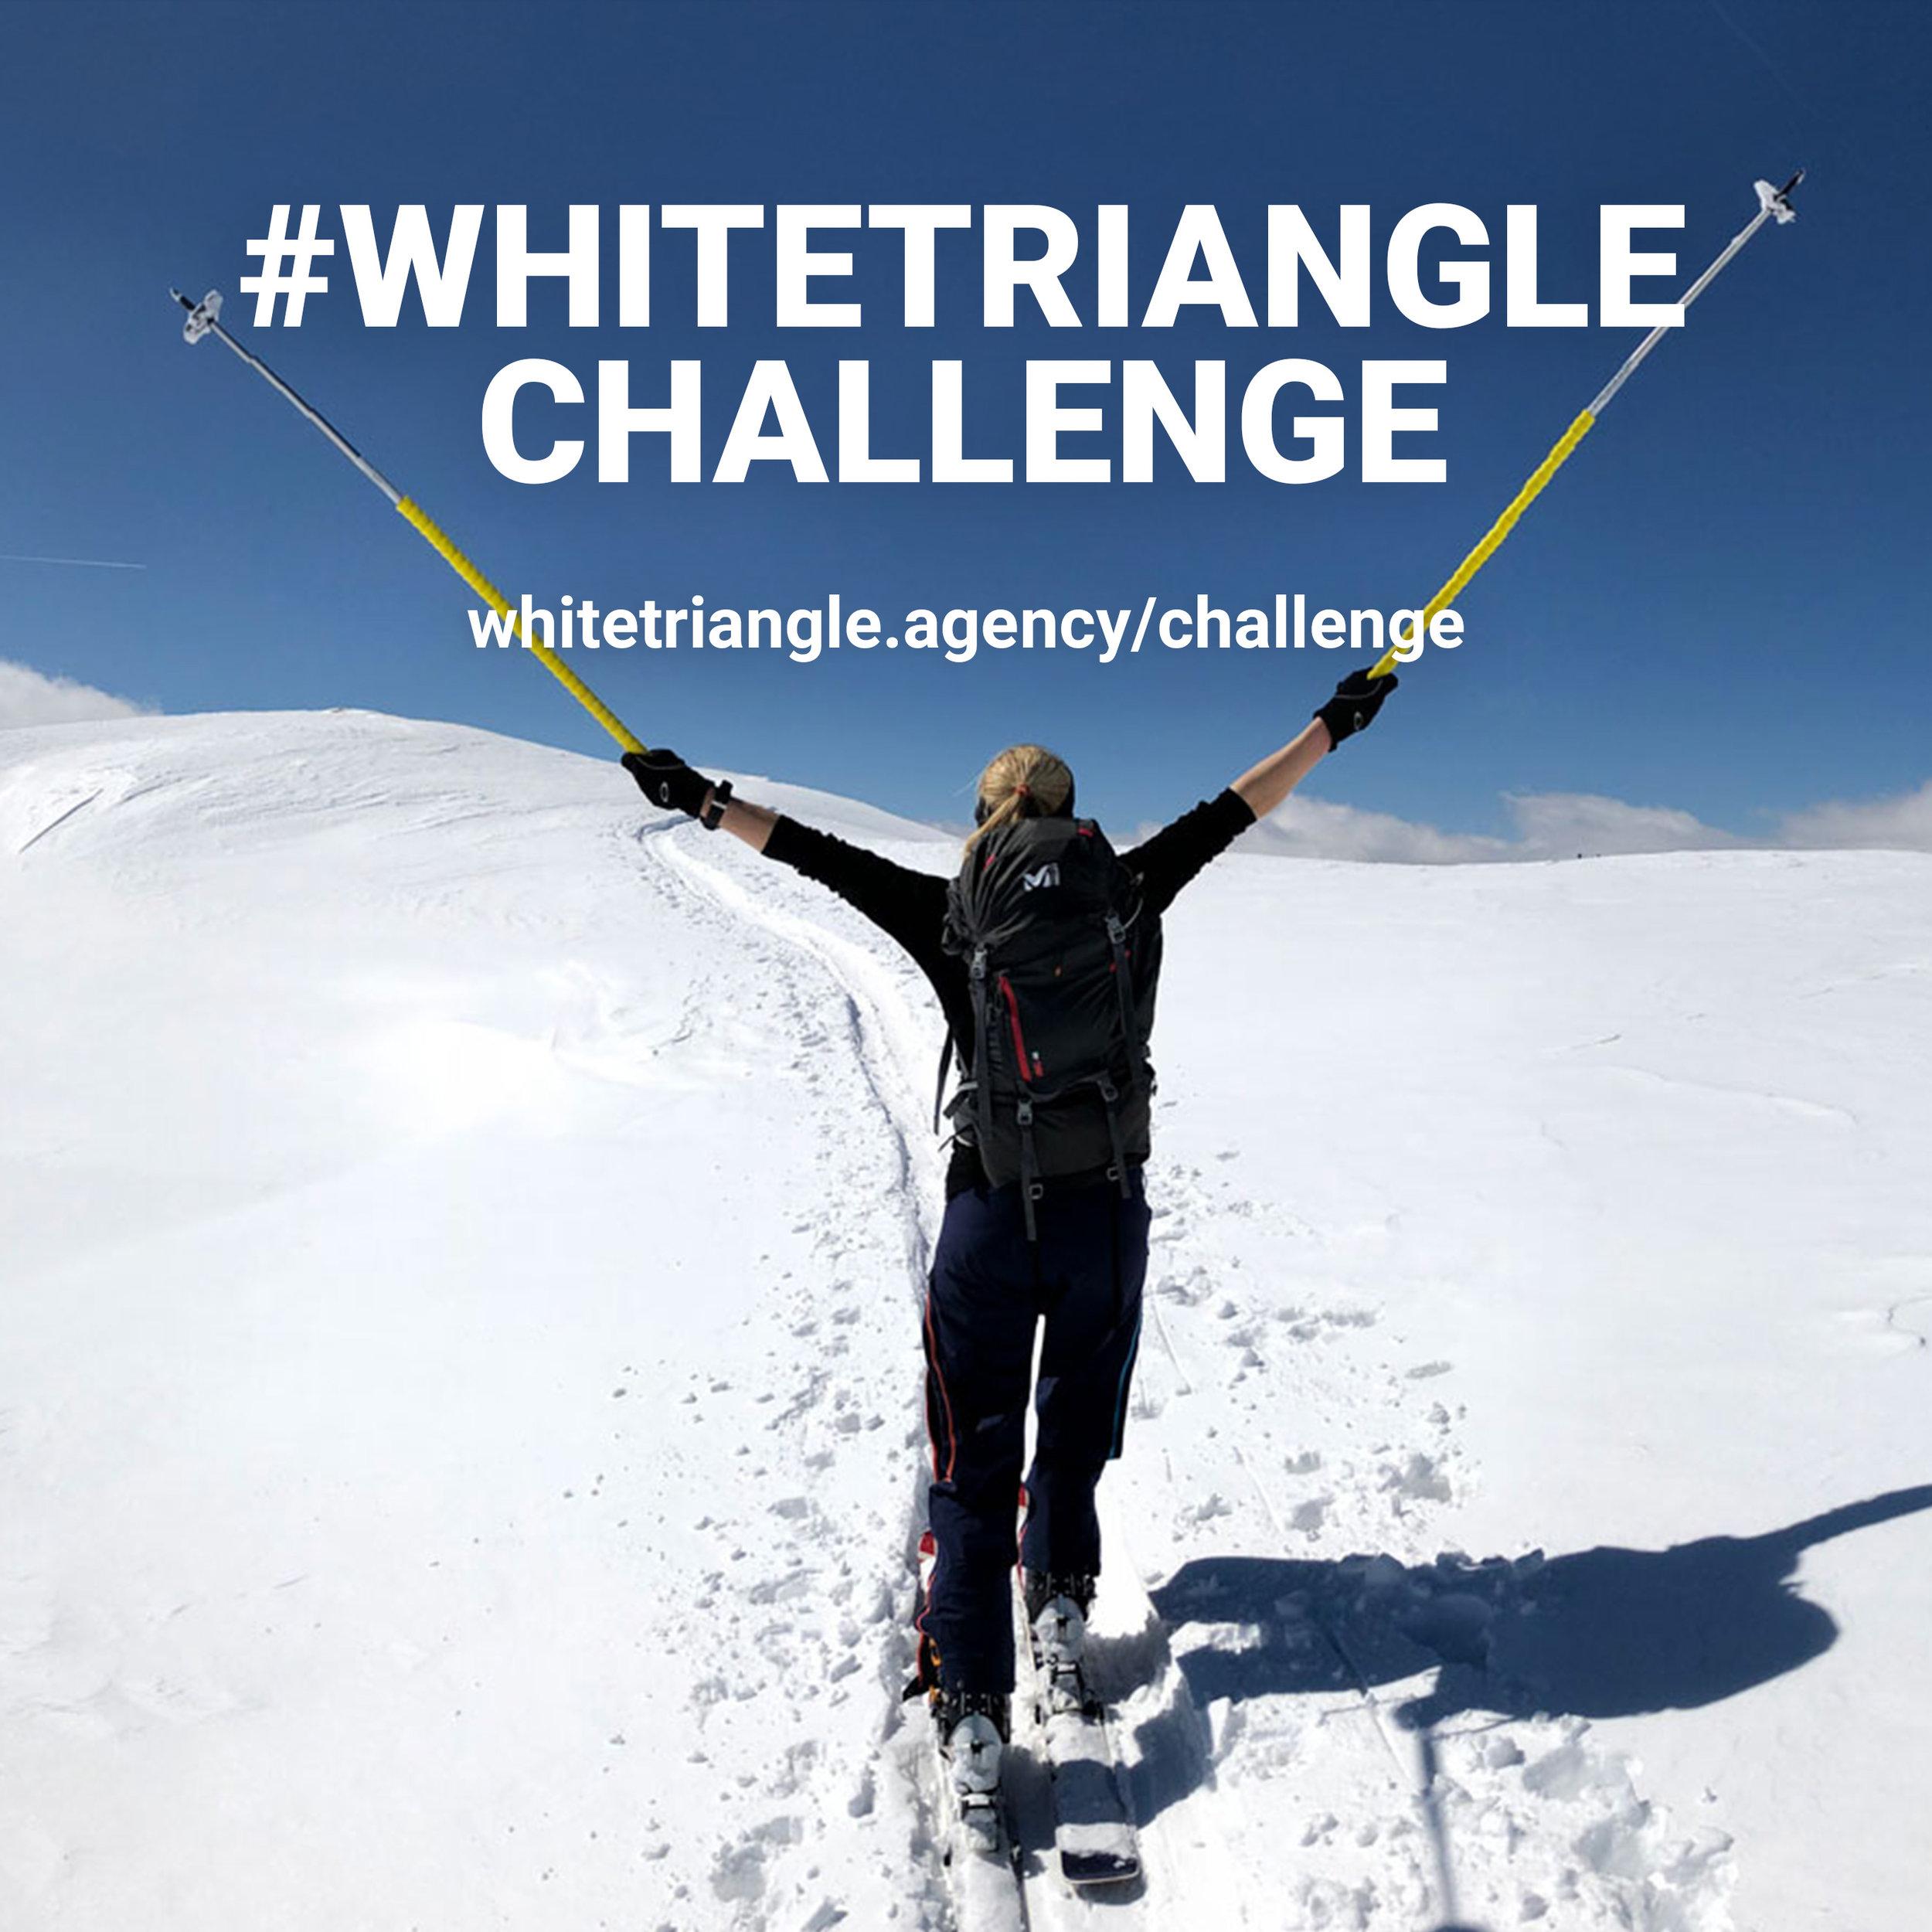 WT-challenge.jpg